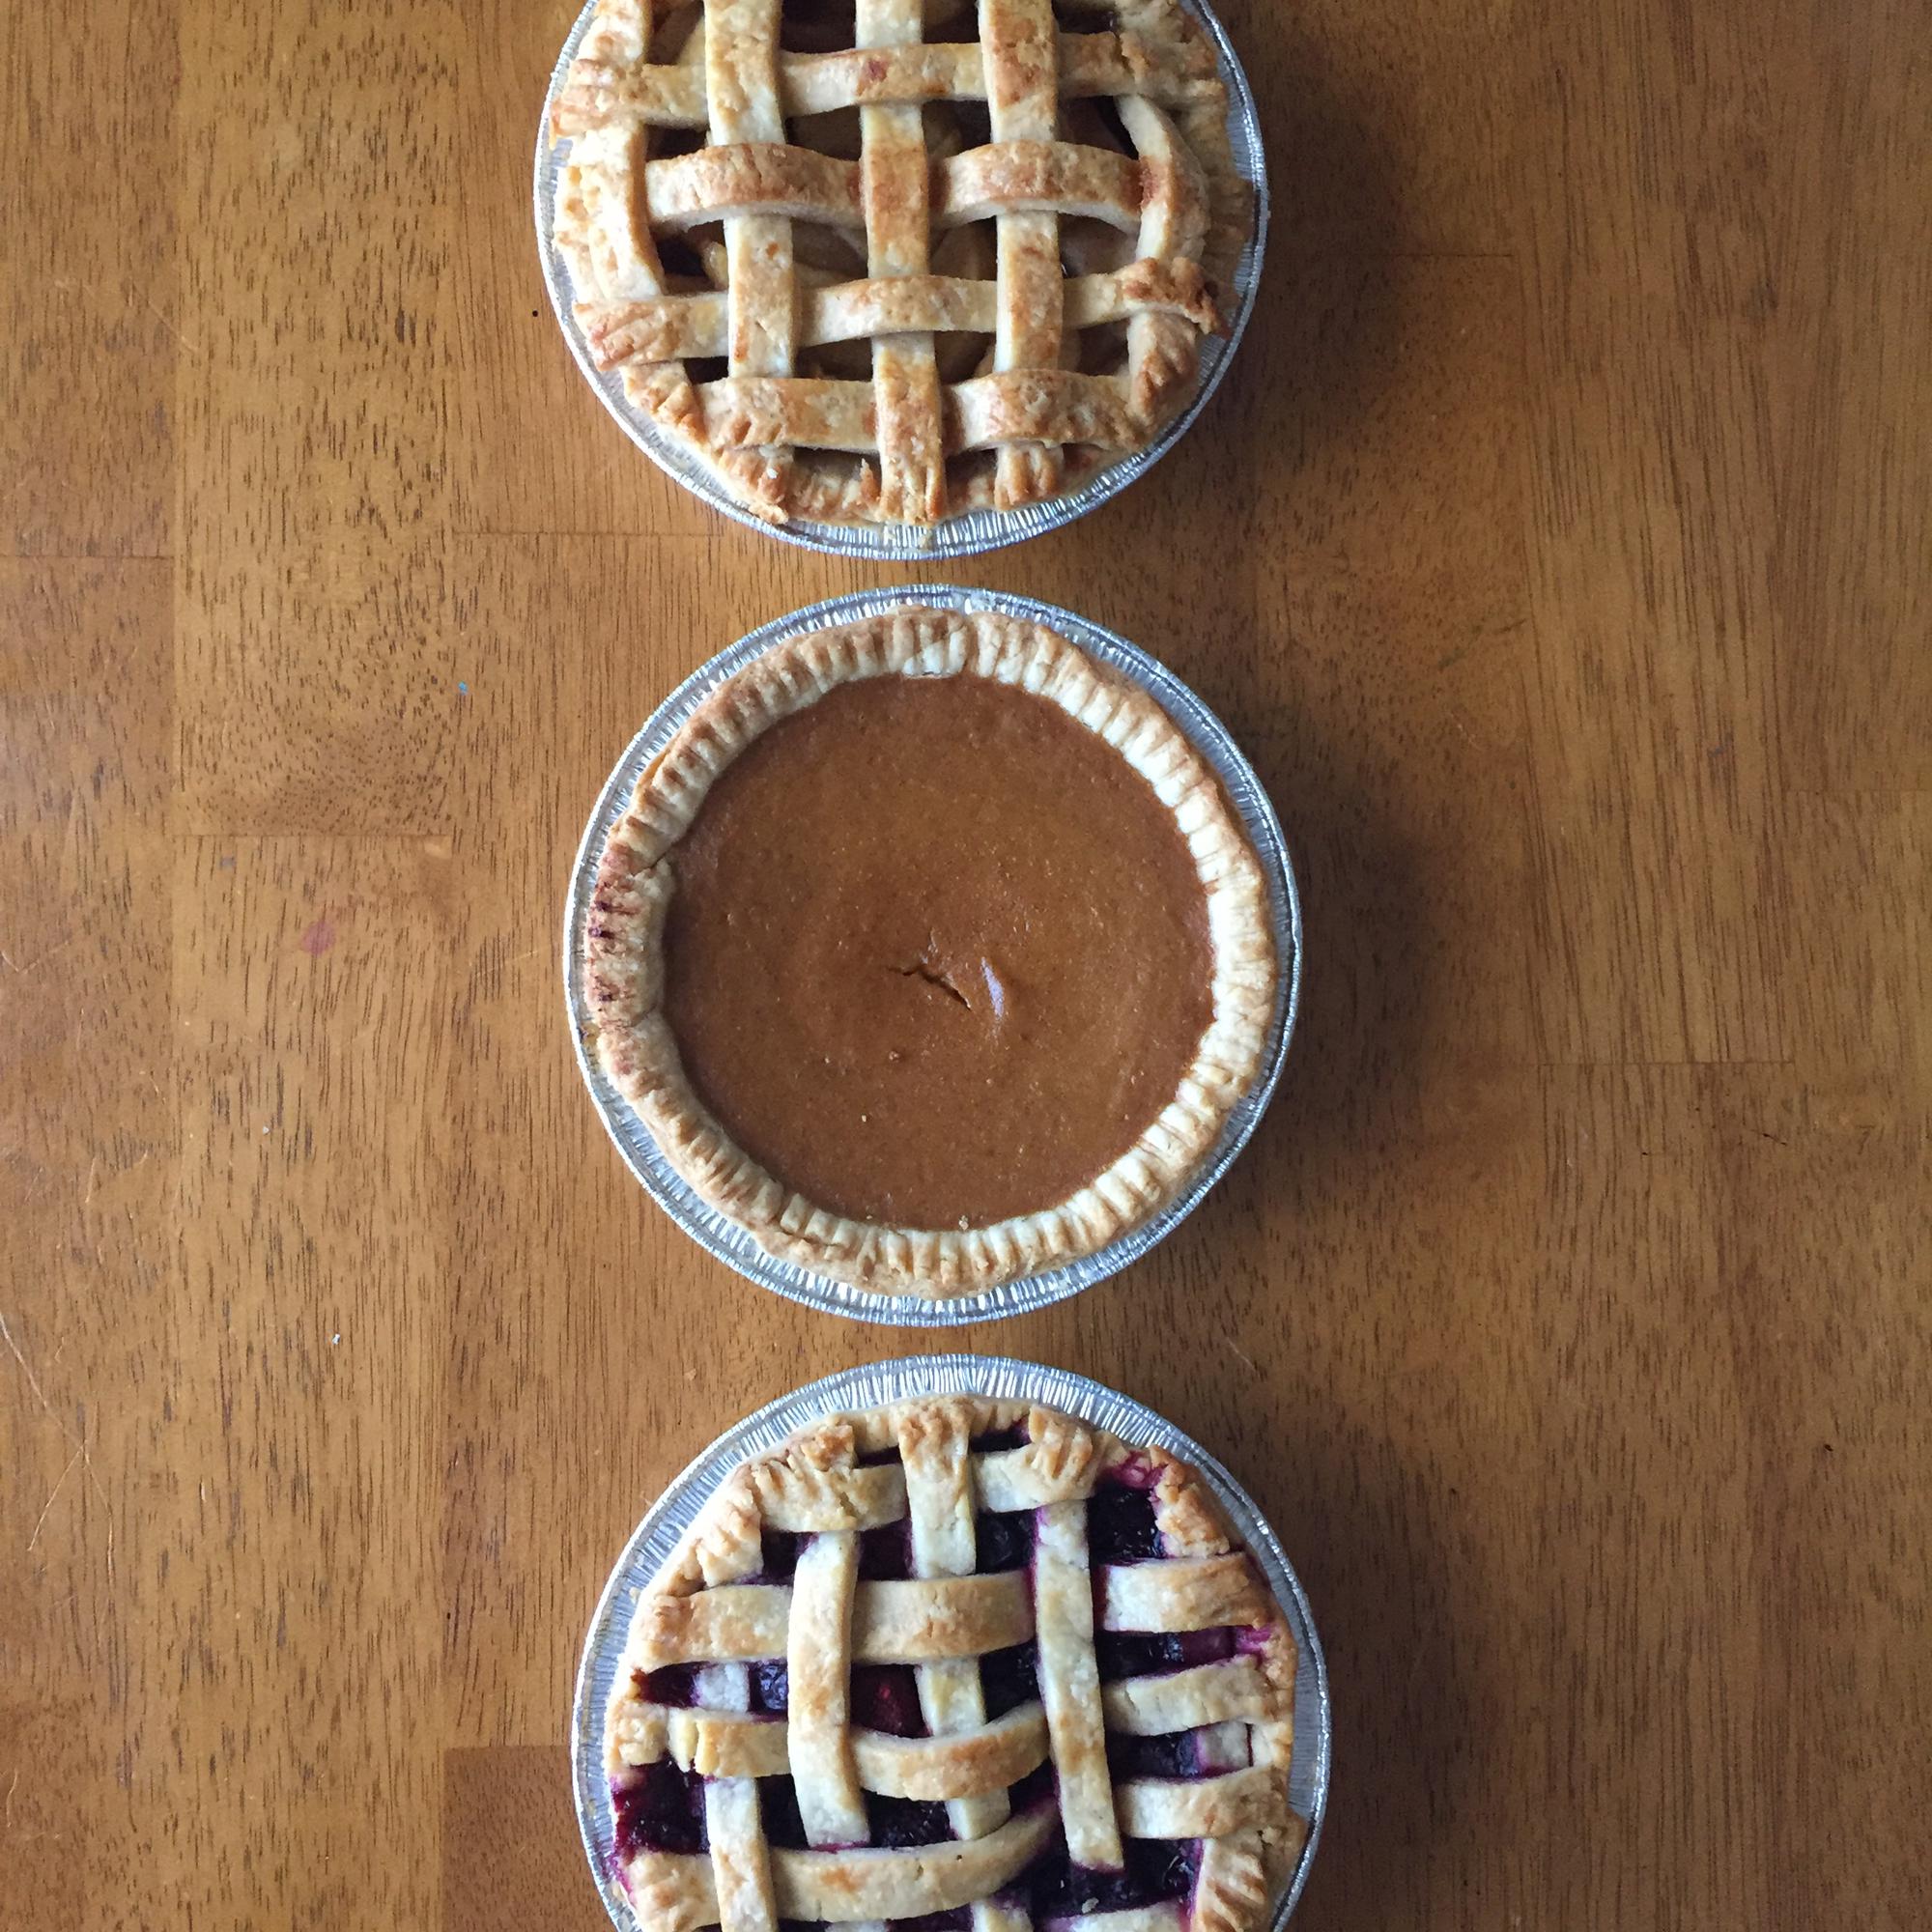 Ruth's Grandma's Pie Crust Lesley J.